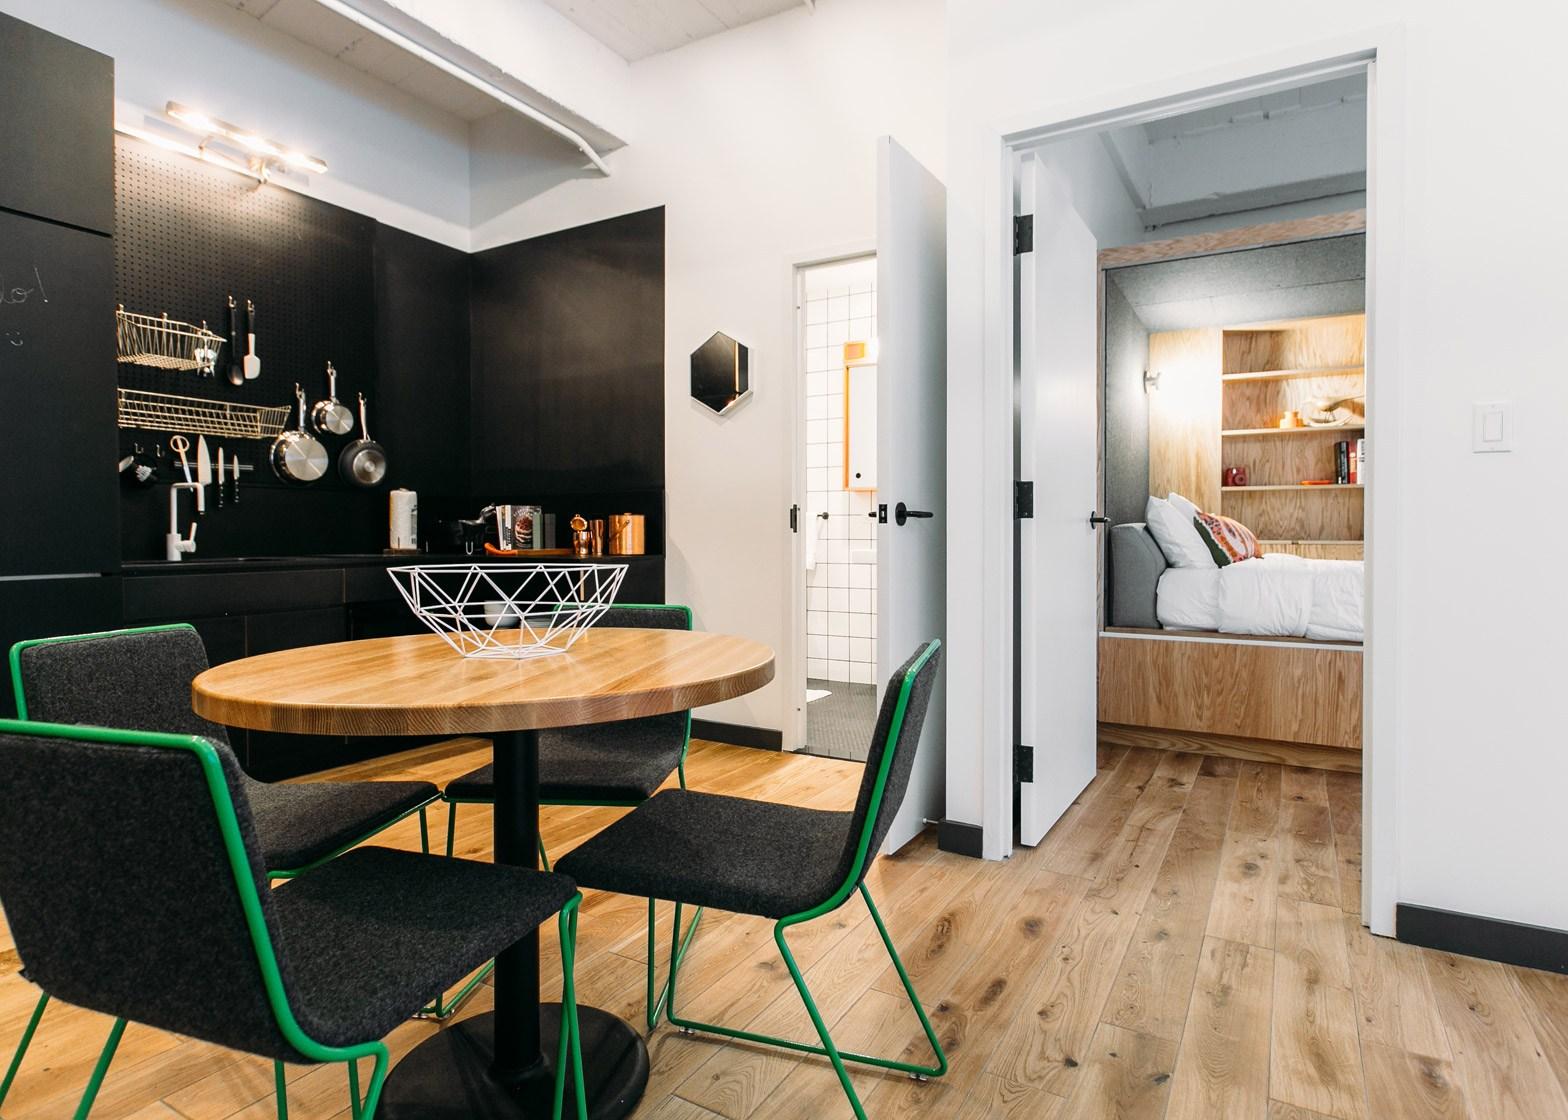 co-living-apartments-welive-new-york-city-usa_dezeen_1568_5.jpg